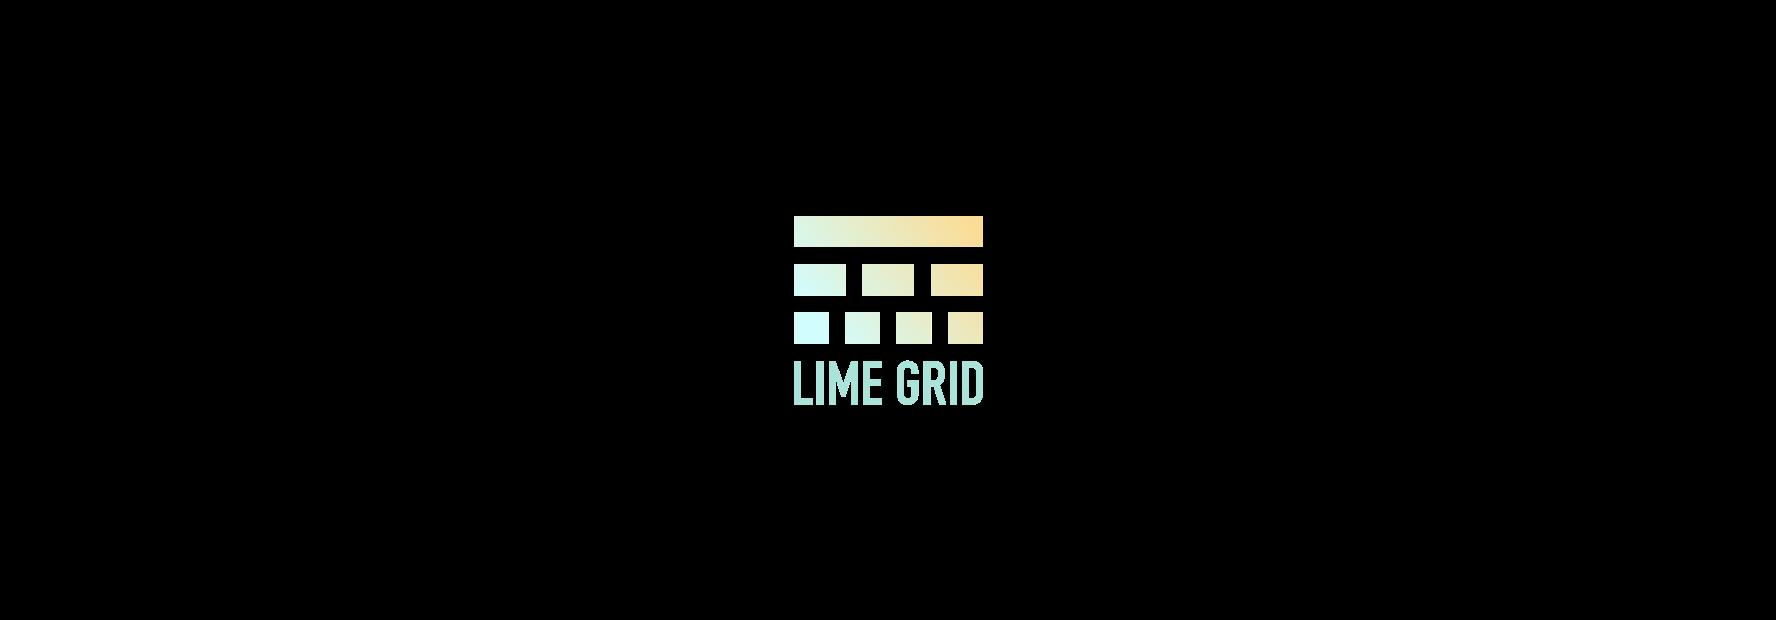 React LIME GRID